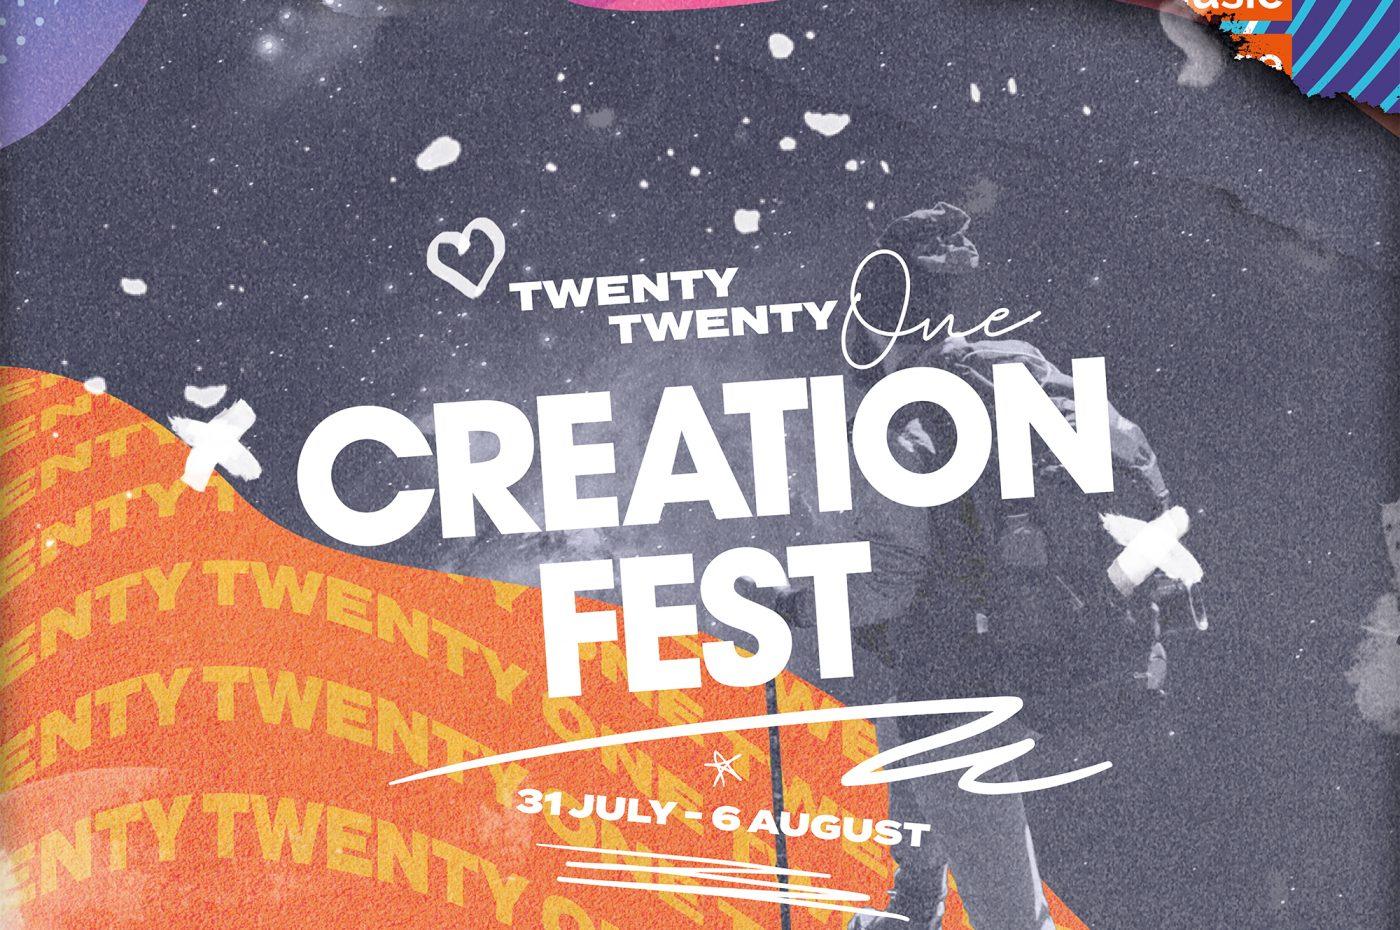 Creation fest Cancellation Square